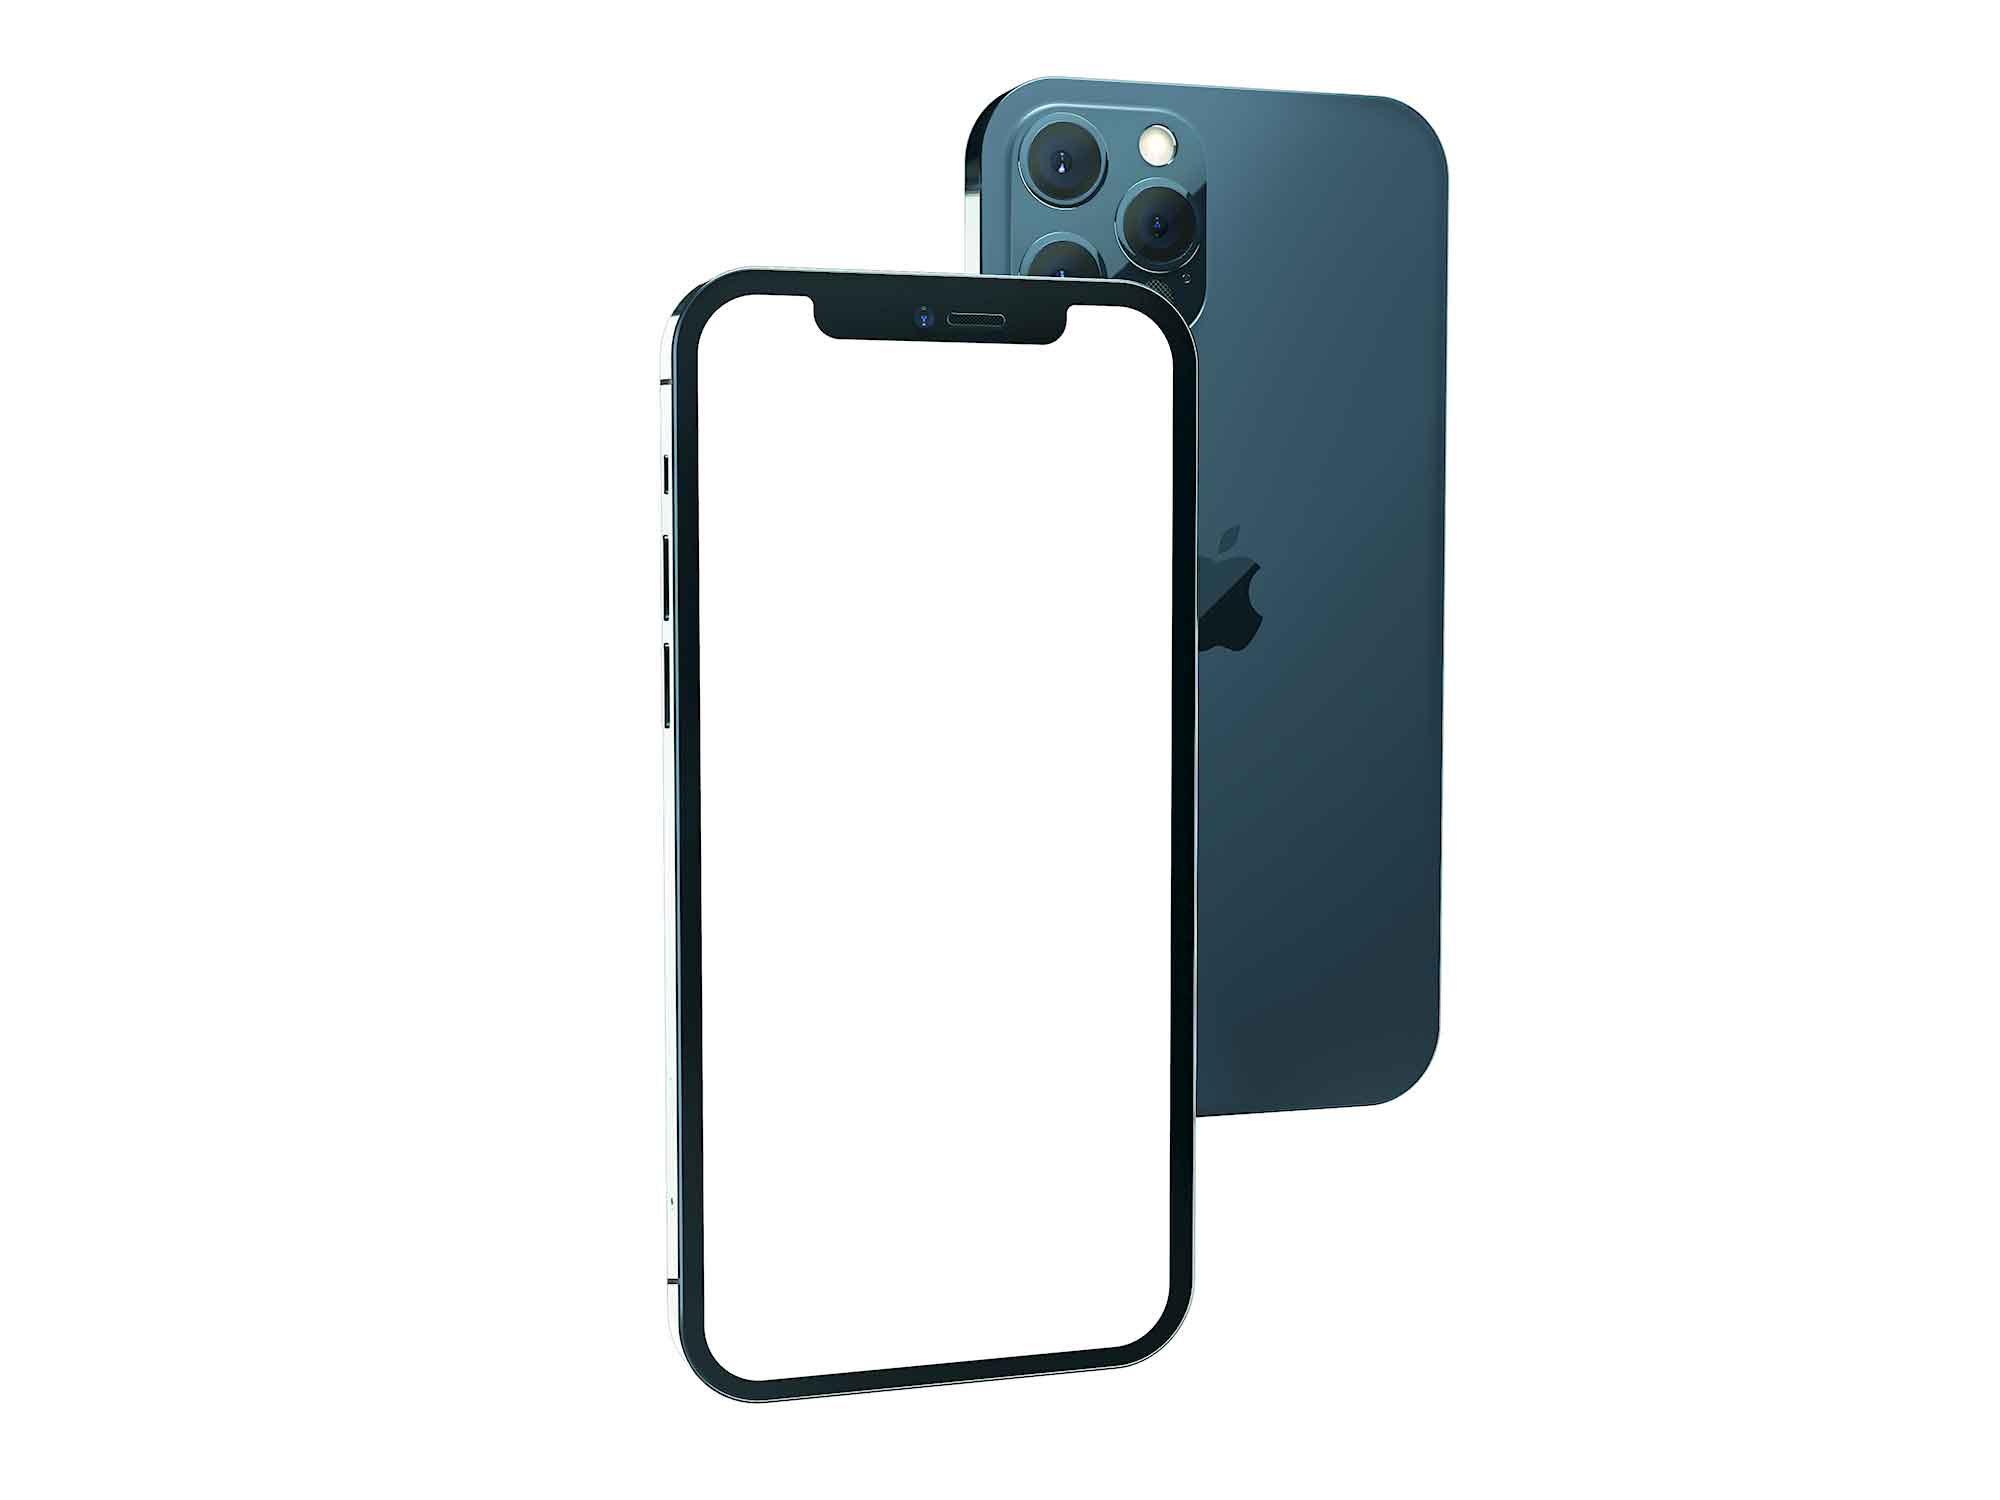 iPhone 12 Pro Isometric Mockup 2